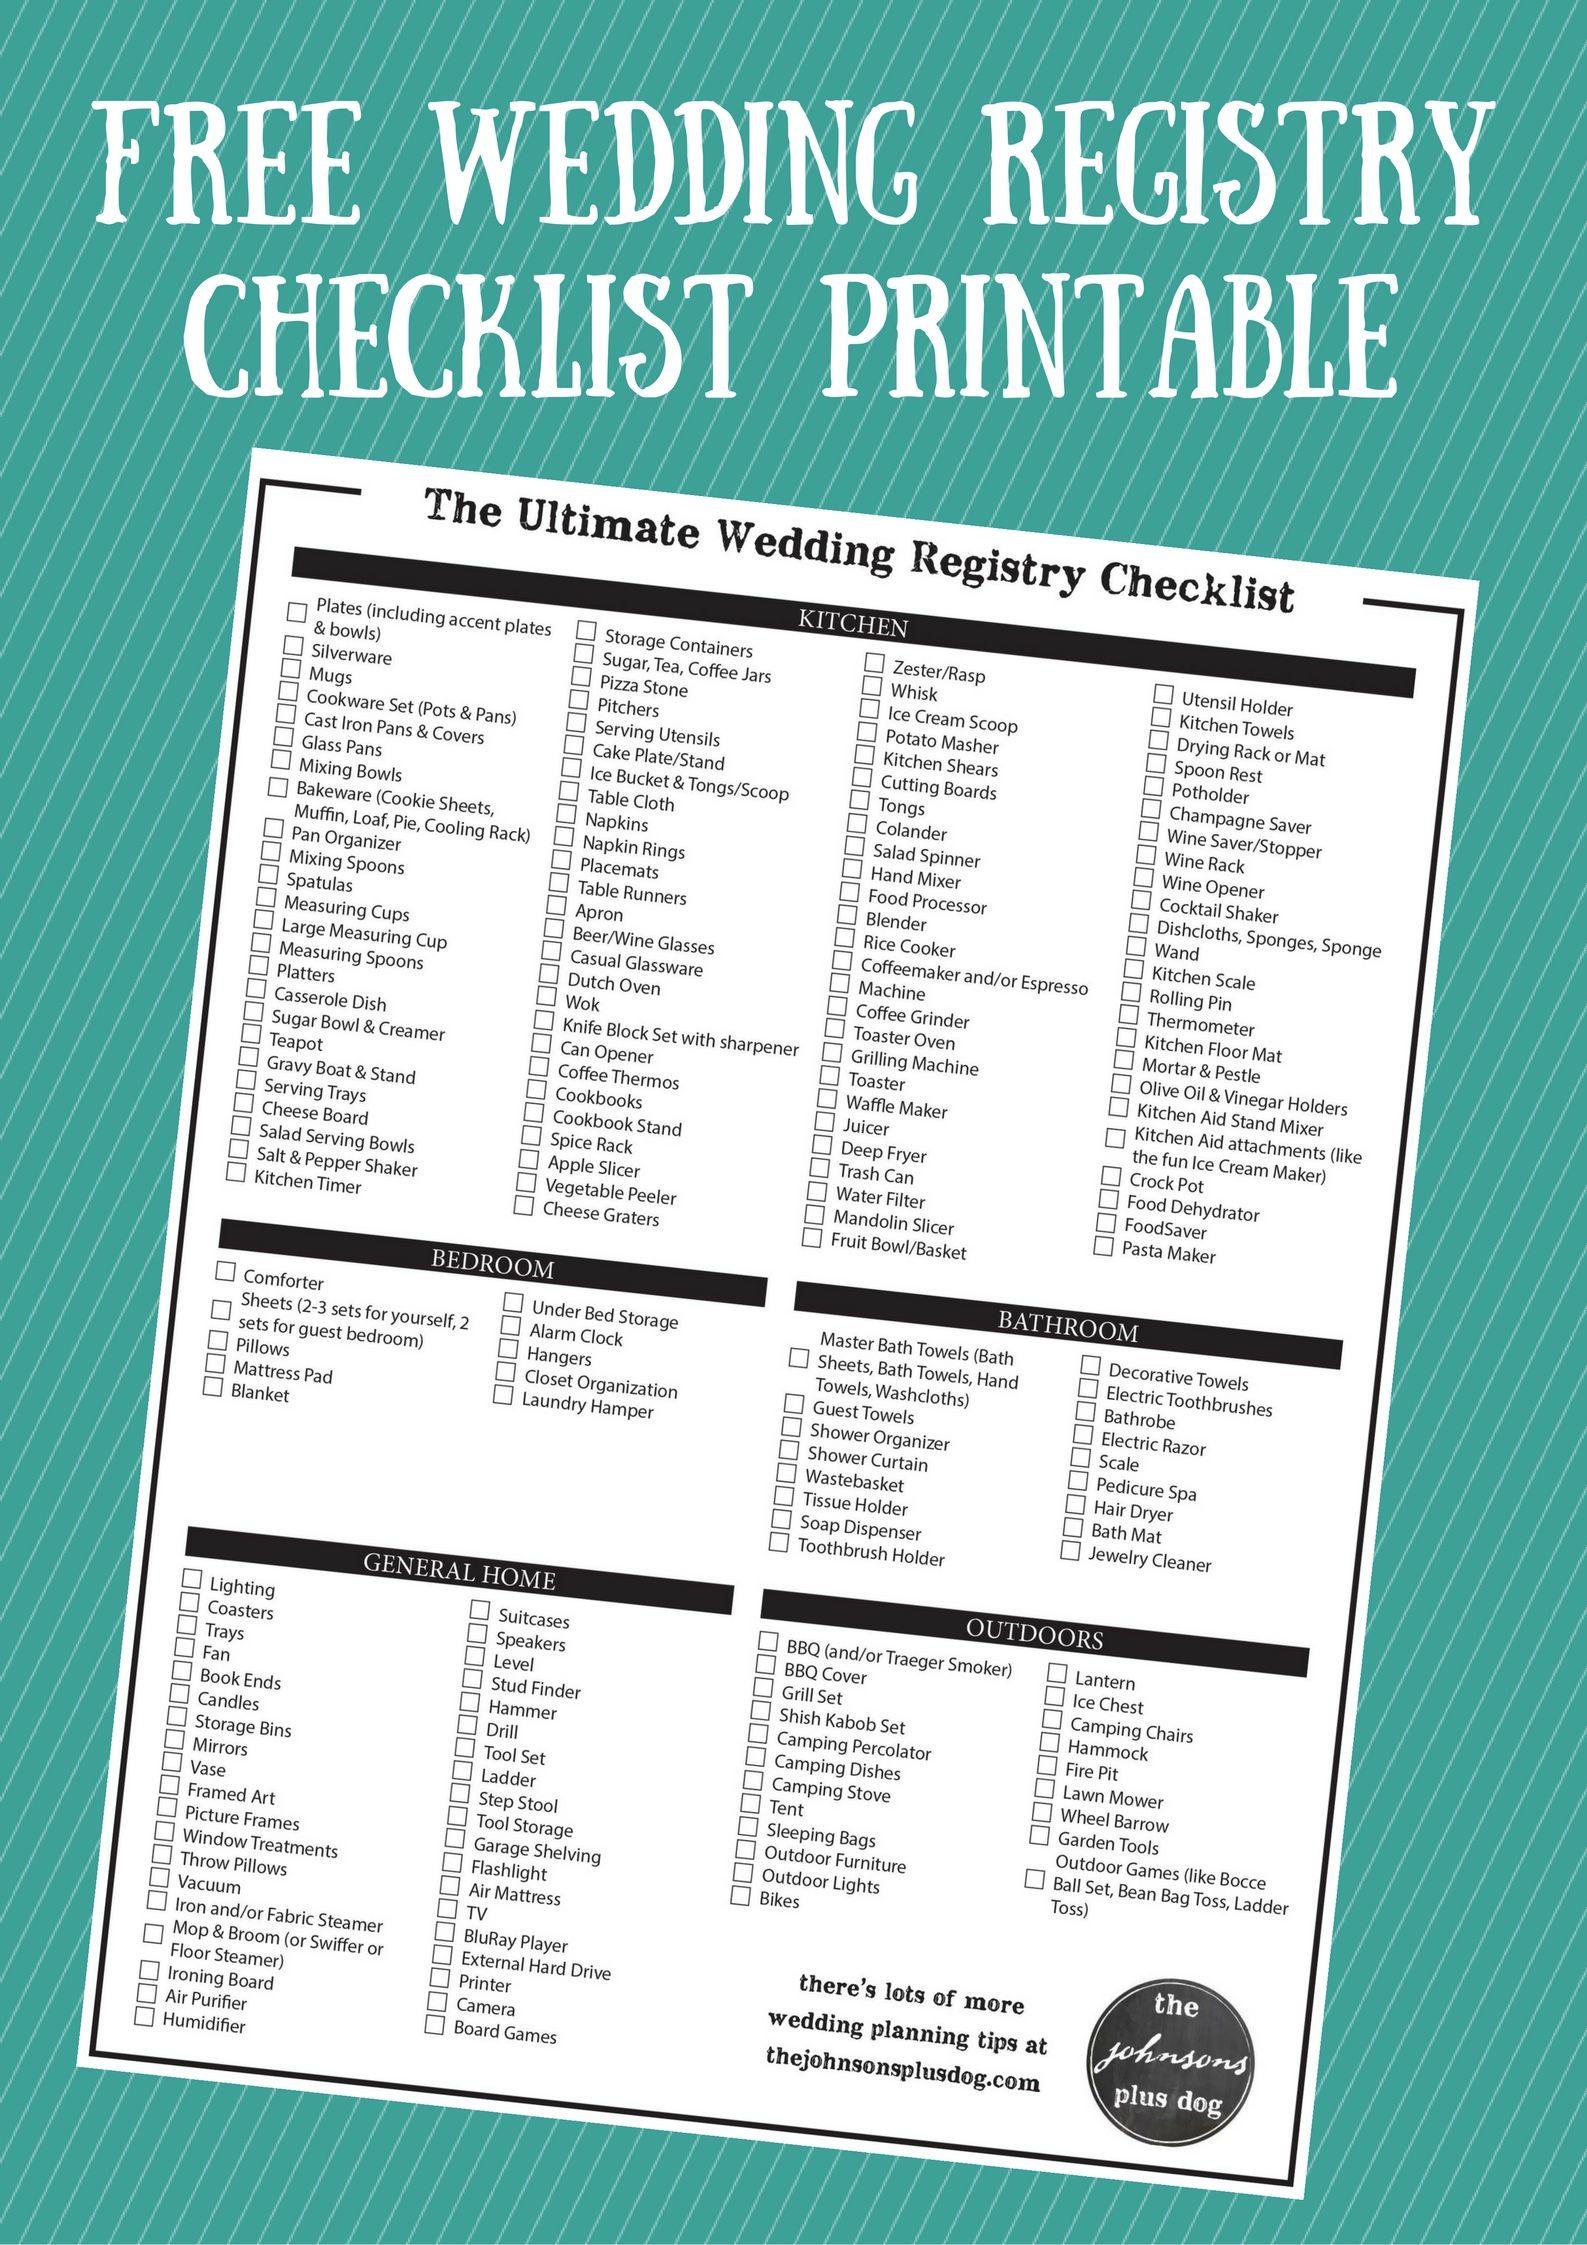 The Ultimate Wedding Registry Checklist + Free Printable